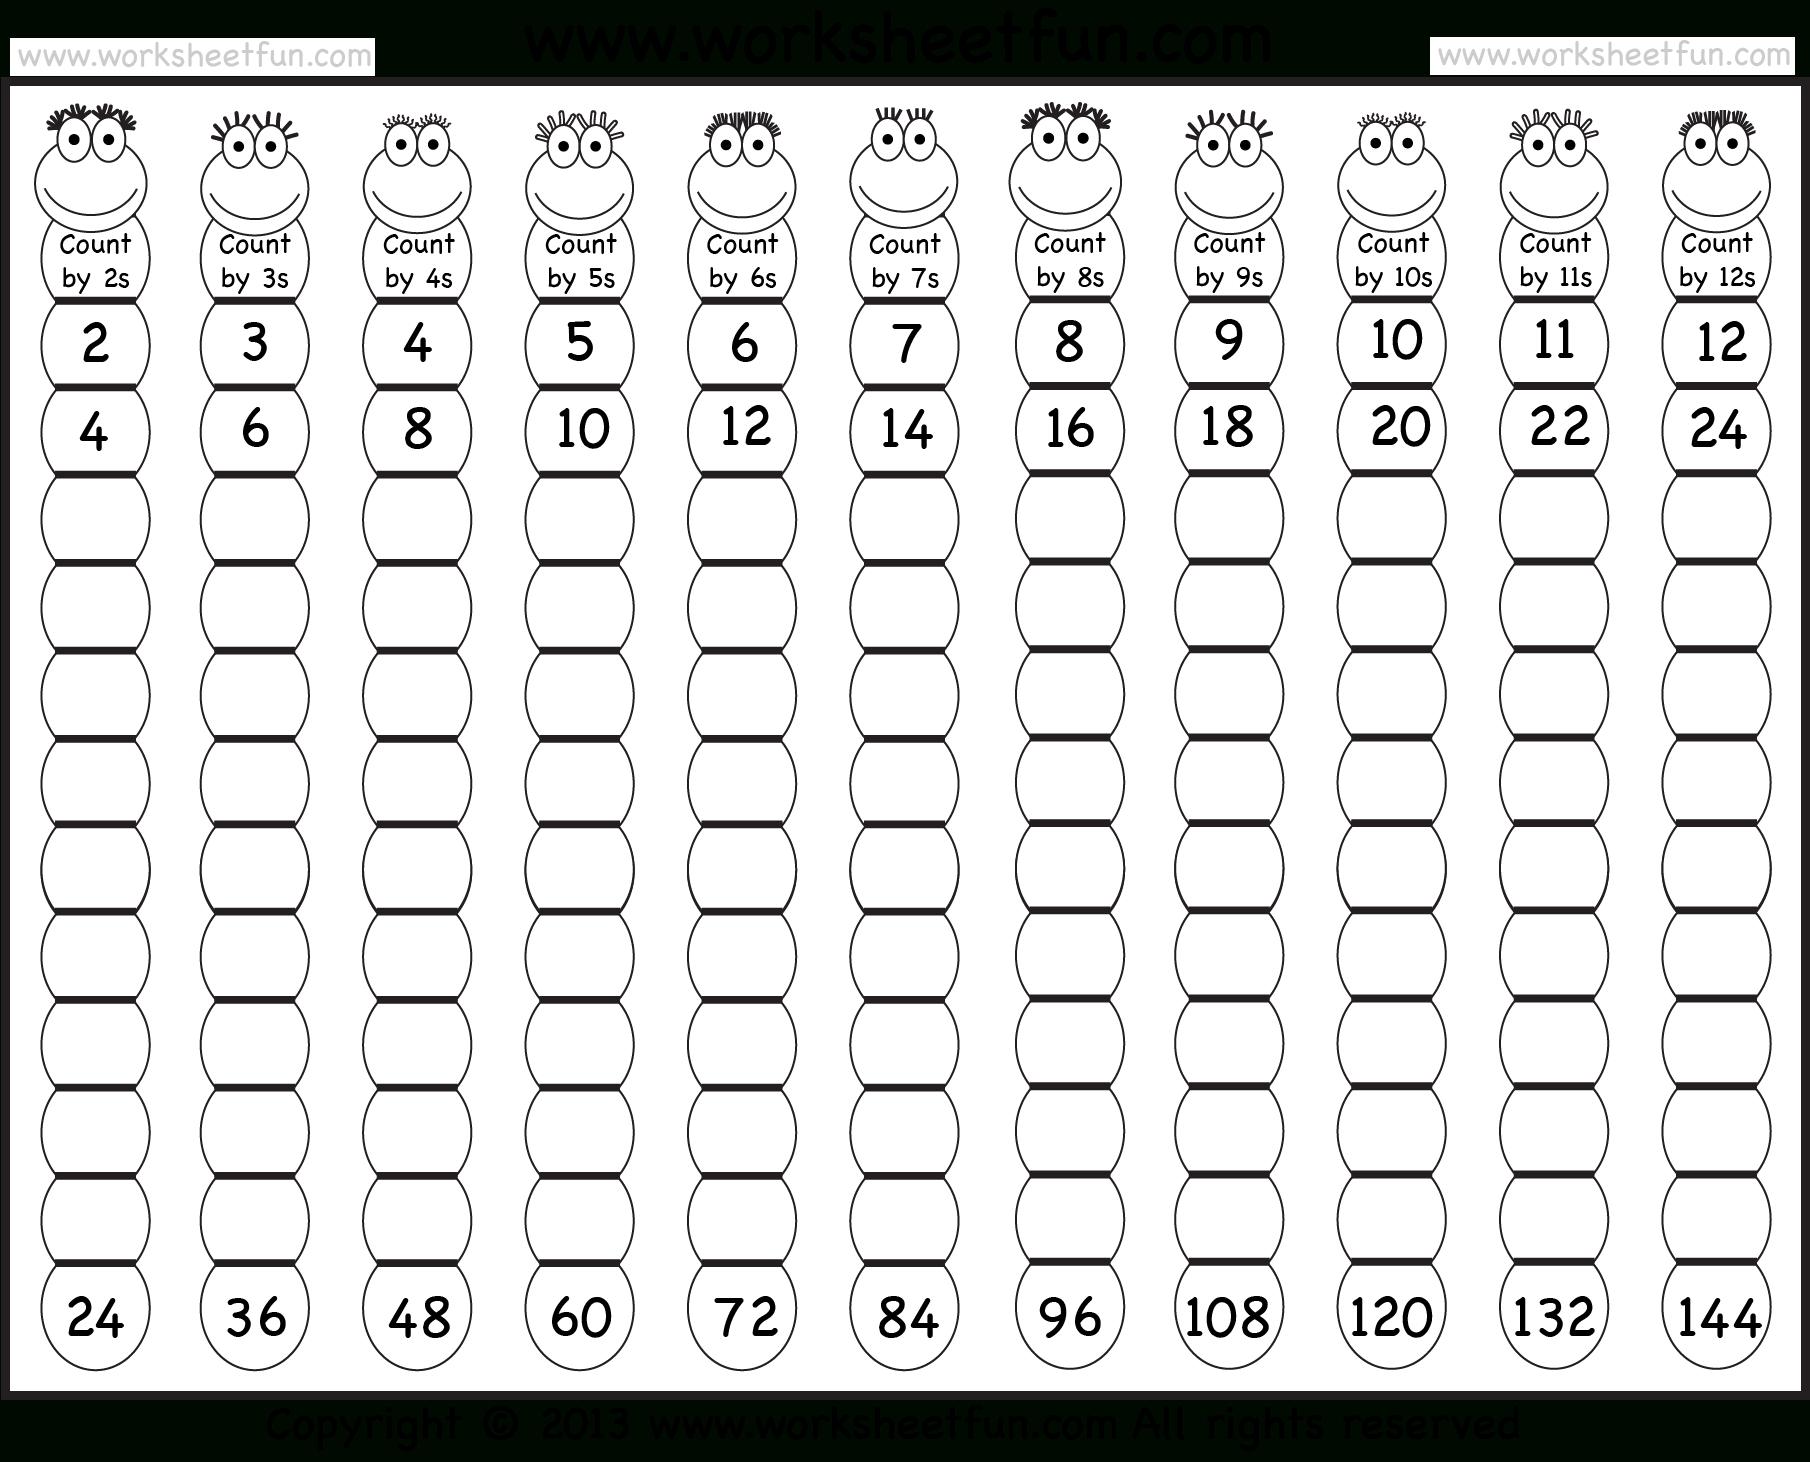 Times Table – 2-12 Worksheets – 1, 2, 3, 4, 5, 6, 7, 8, 9, 10, 11 | Multiplication Tables 1 12 Printable Worksheets